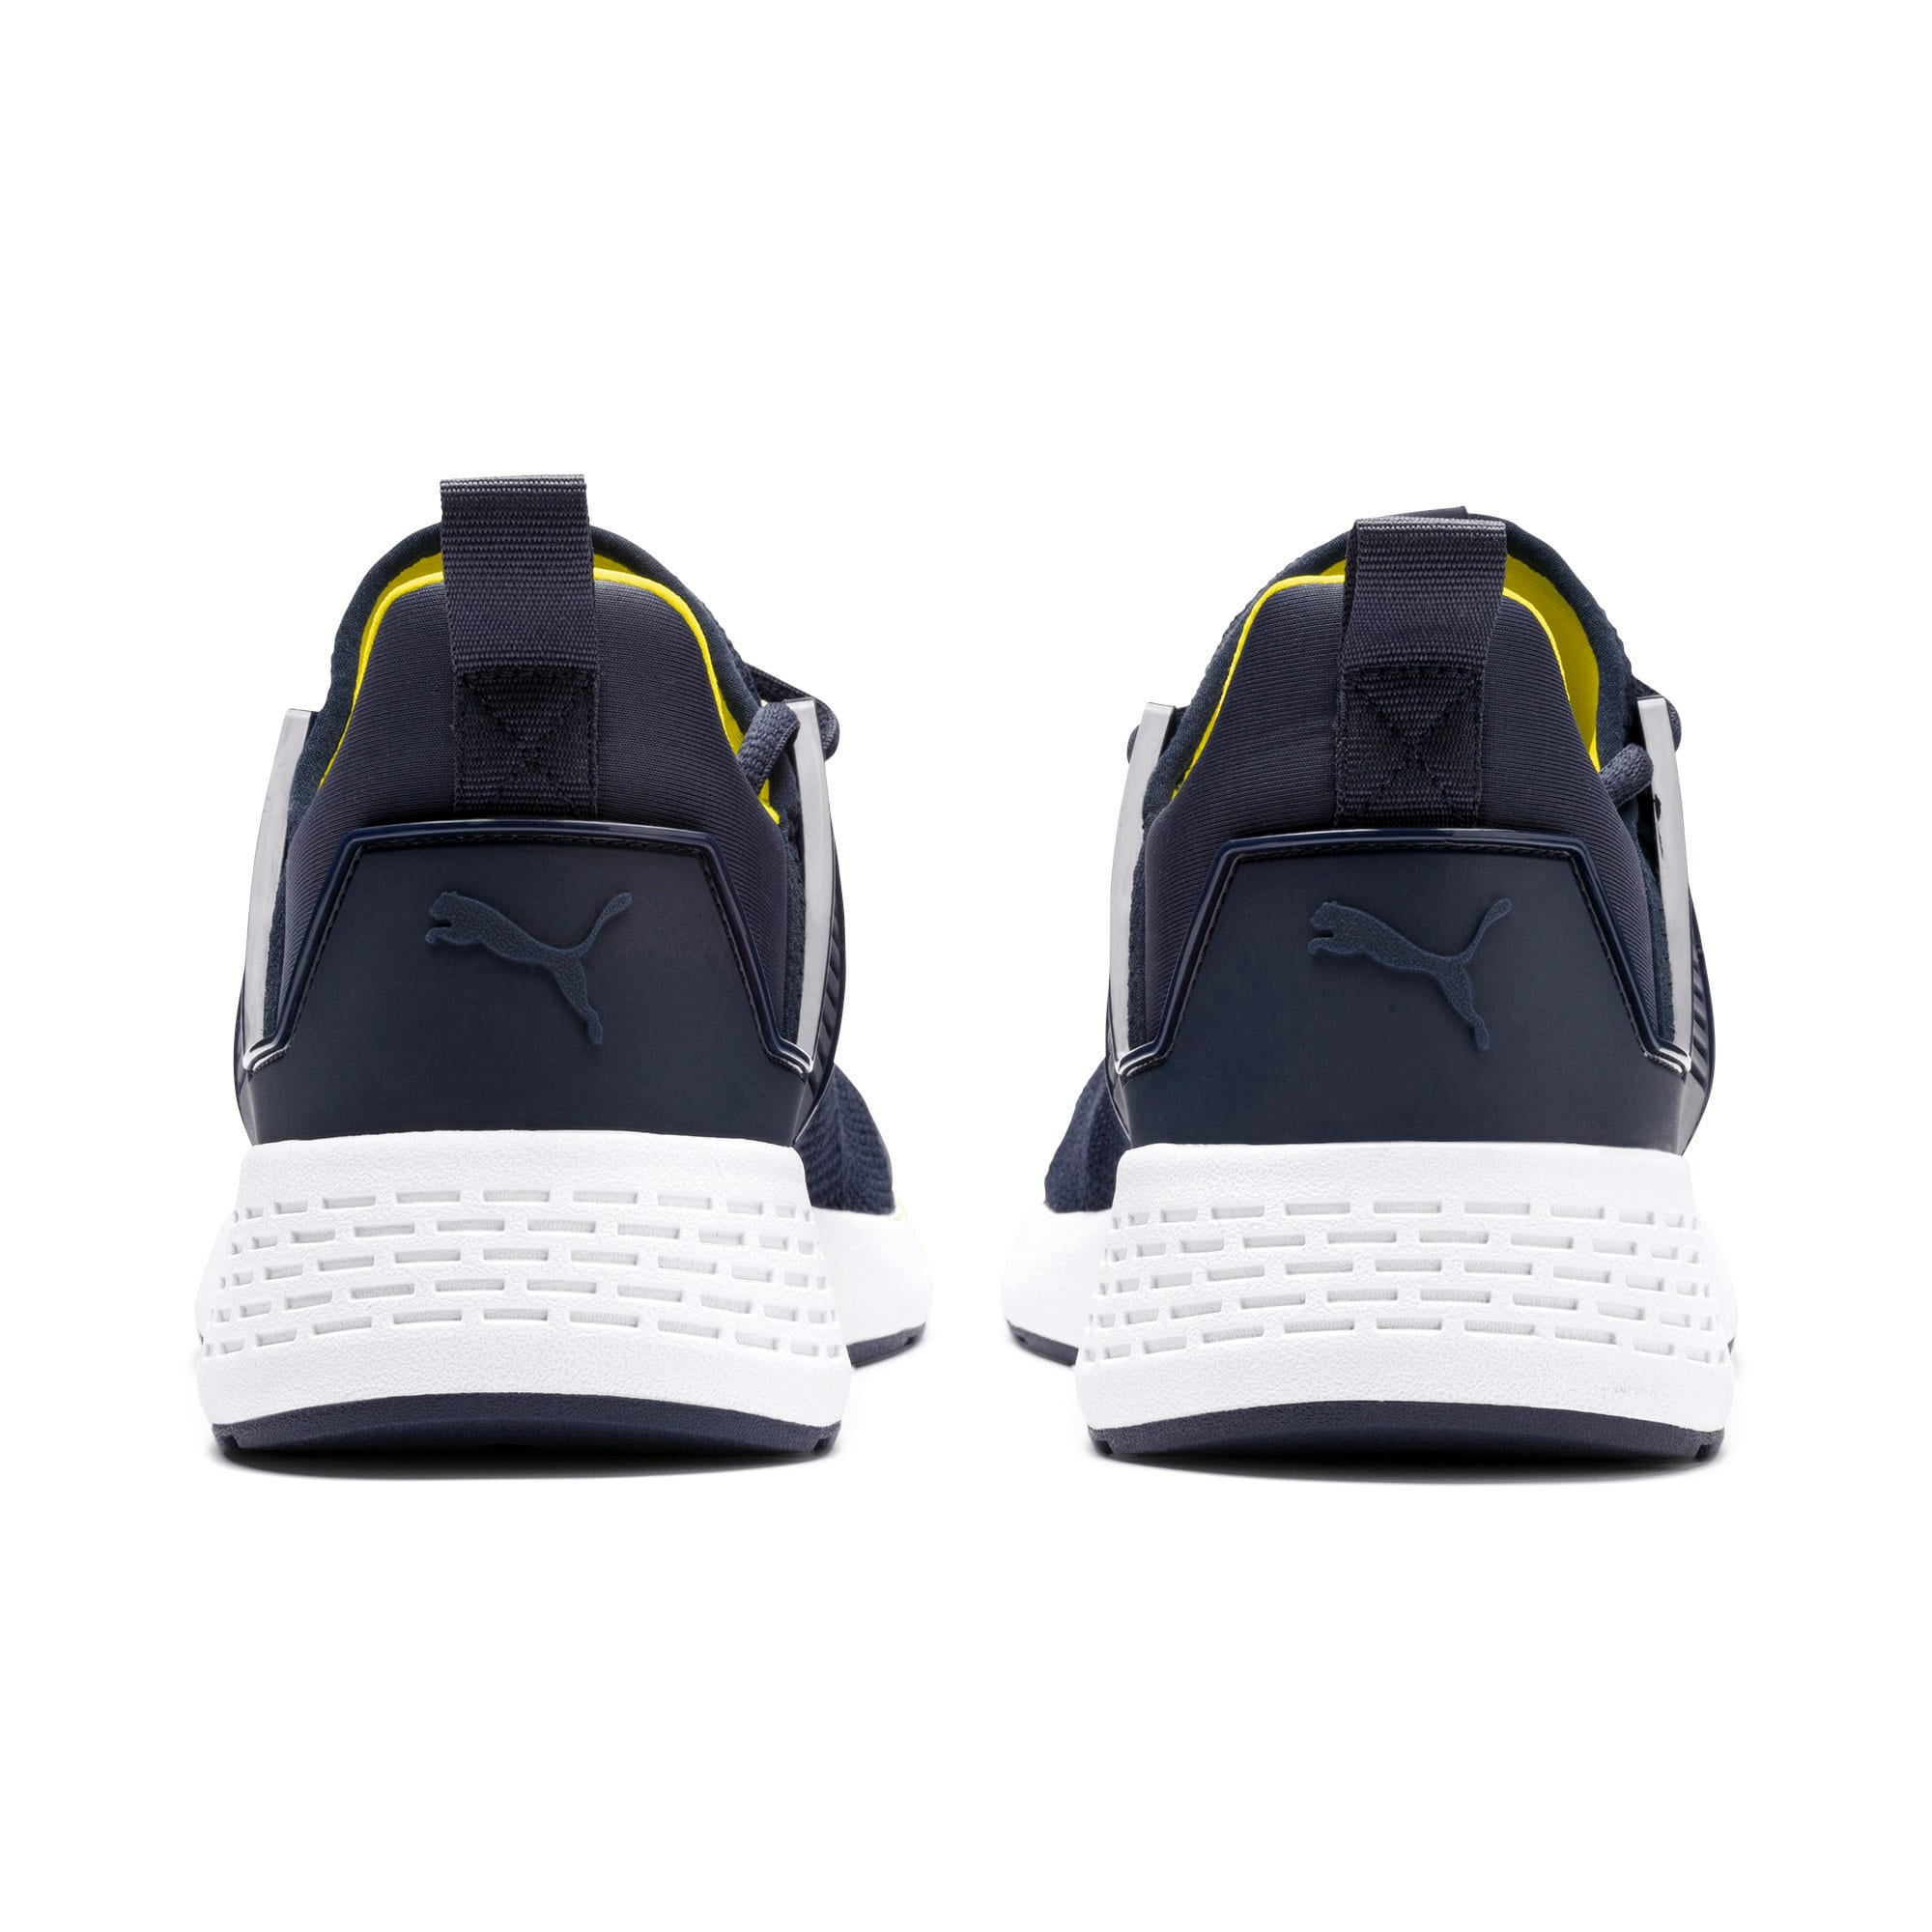 Thumbnail 2 of Insurge Mesh Sneakers, Peacoat-Blazing Yellow-White, medium-IND